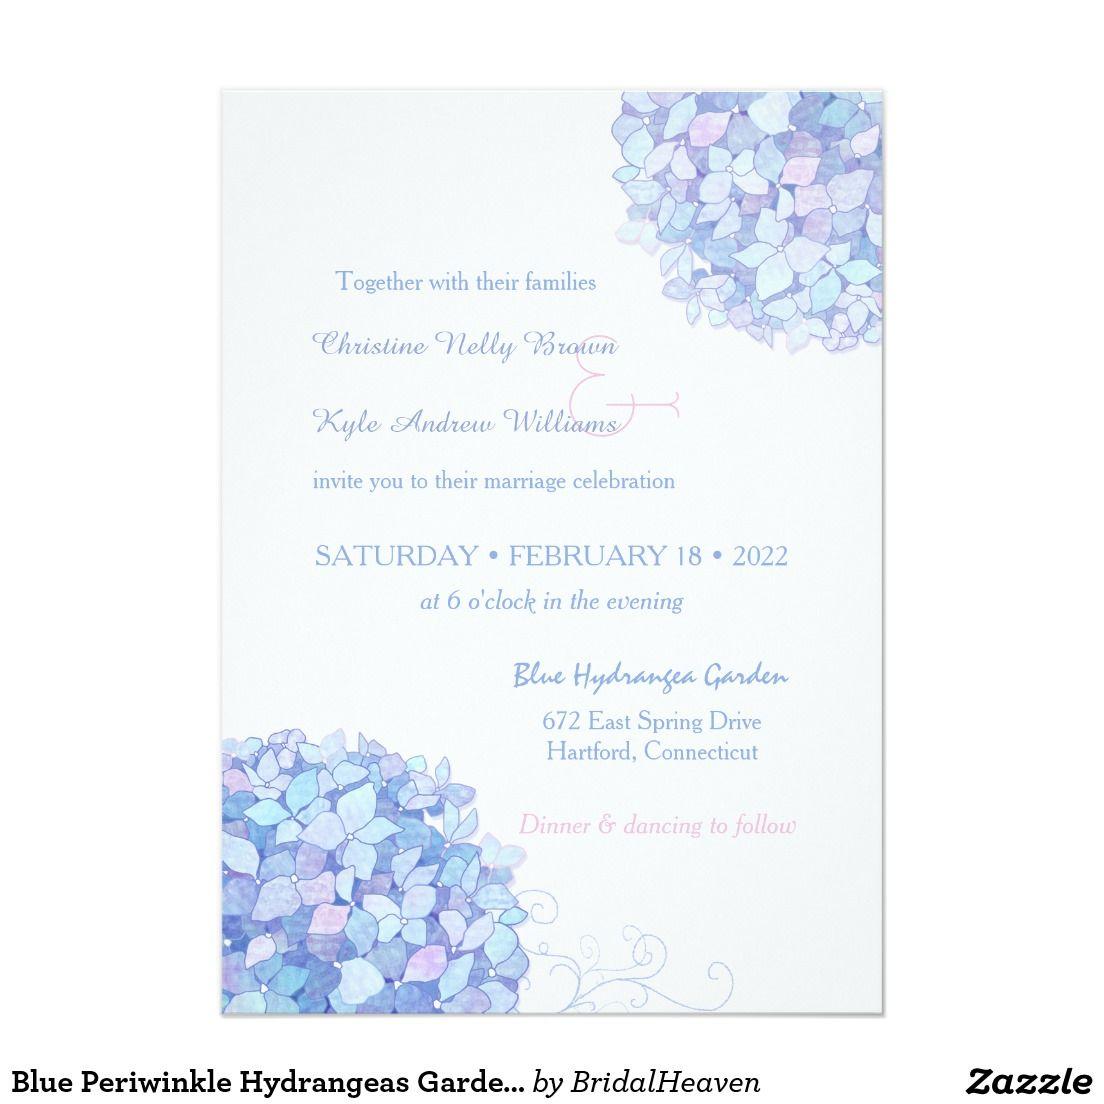 Blue Periwinkle Hydrangeas Garden Wedding Invitation  Zazzle.com